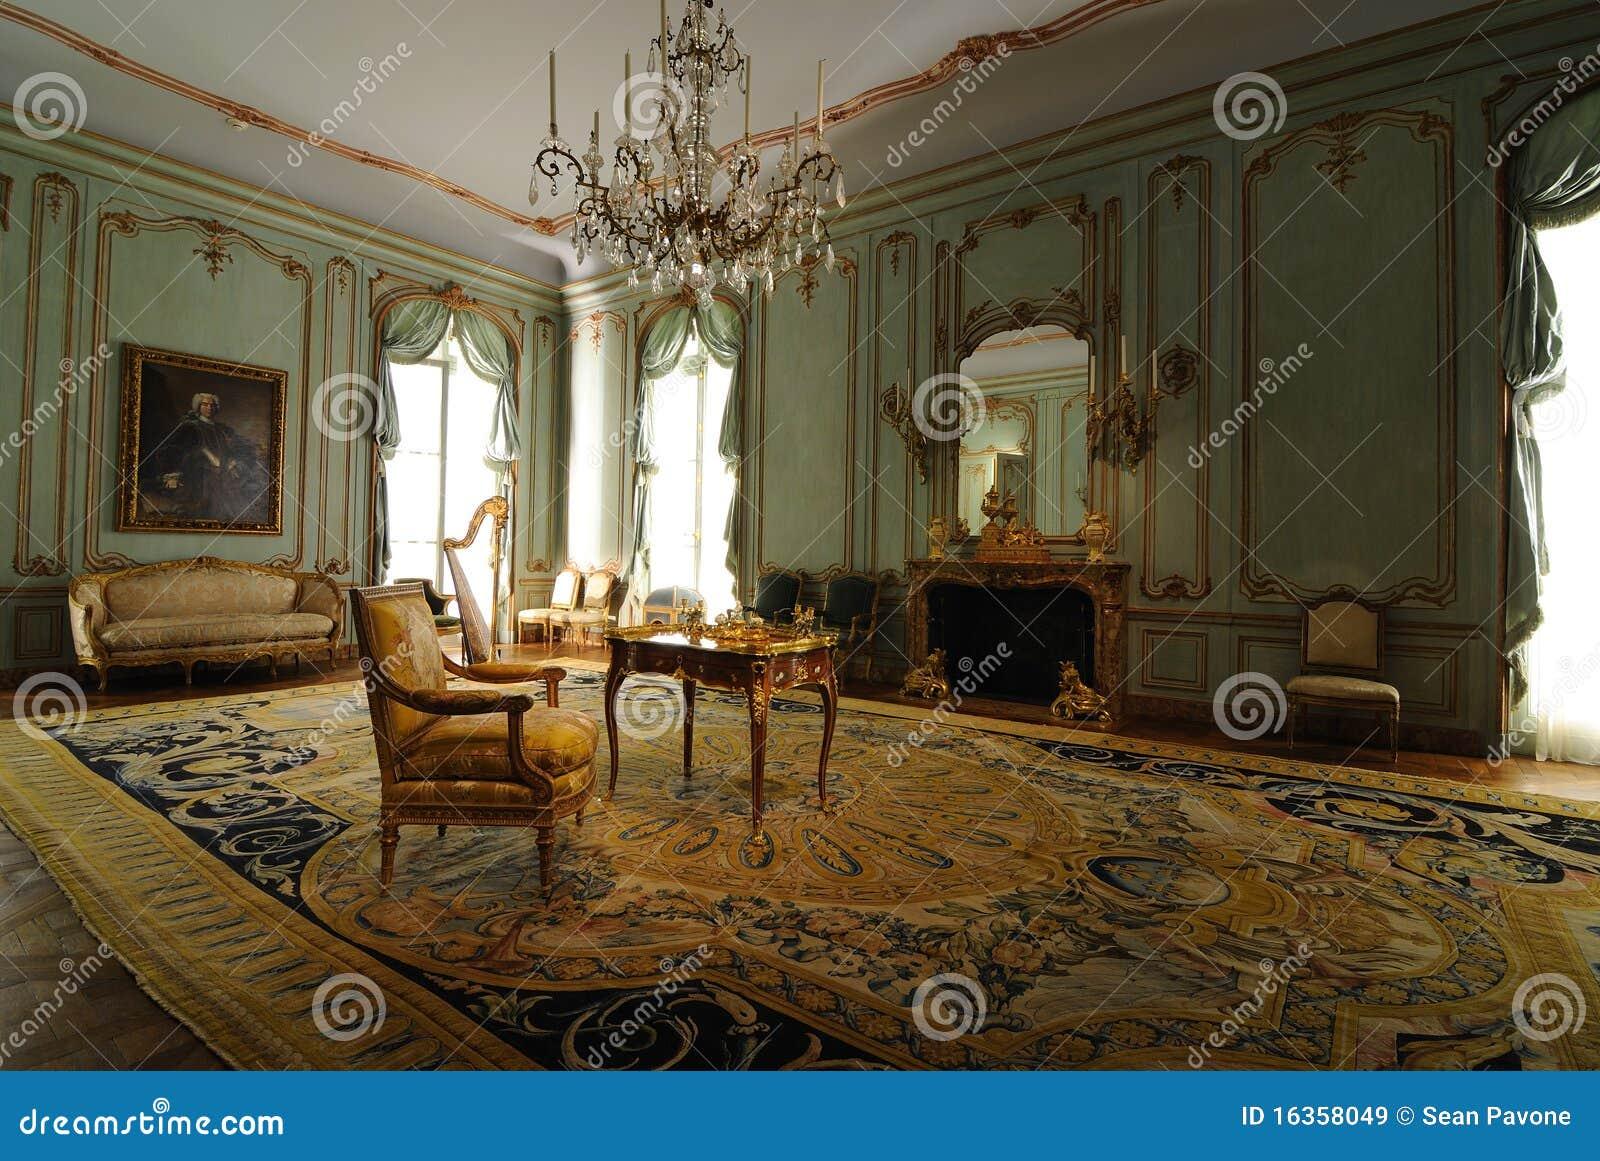 Viennese room interior editorial stock image image 16358049 for Interior design wien